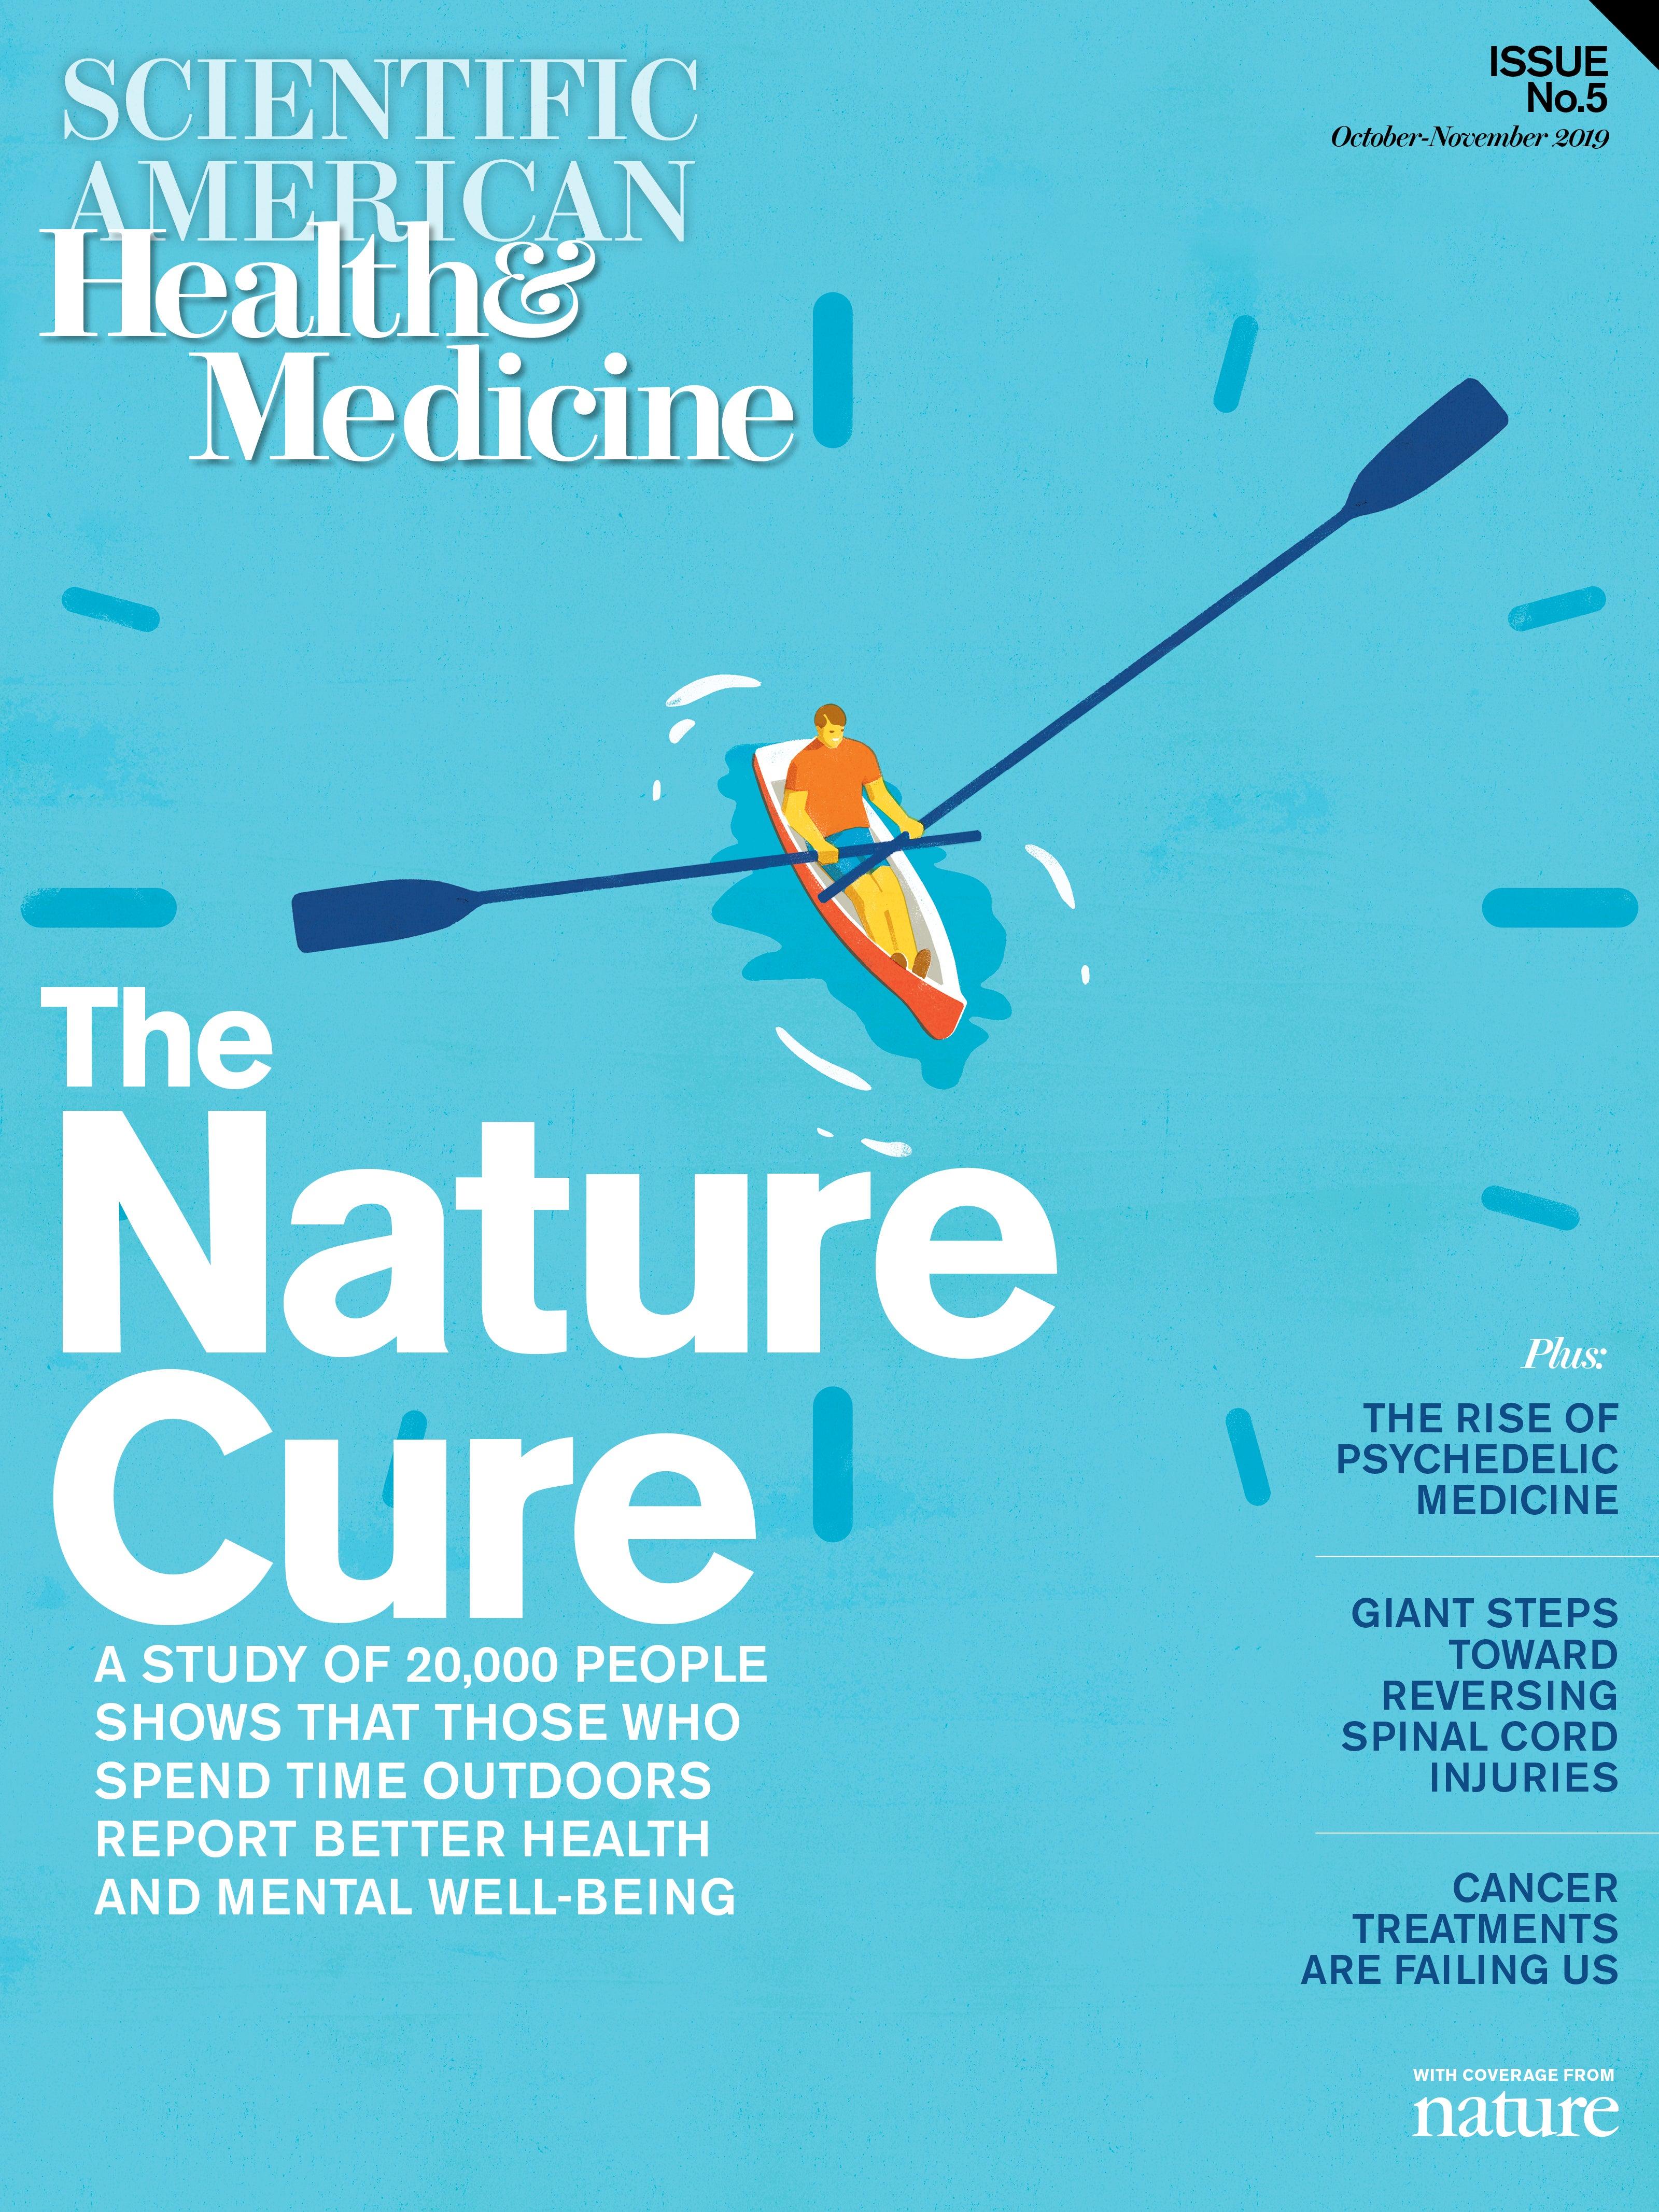 Scientific American Health & Medicine, Volume 1, Issue 5